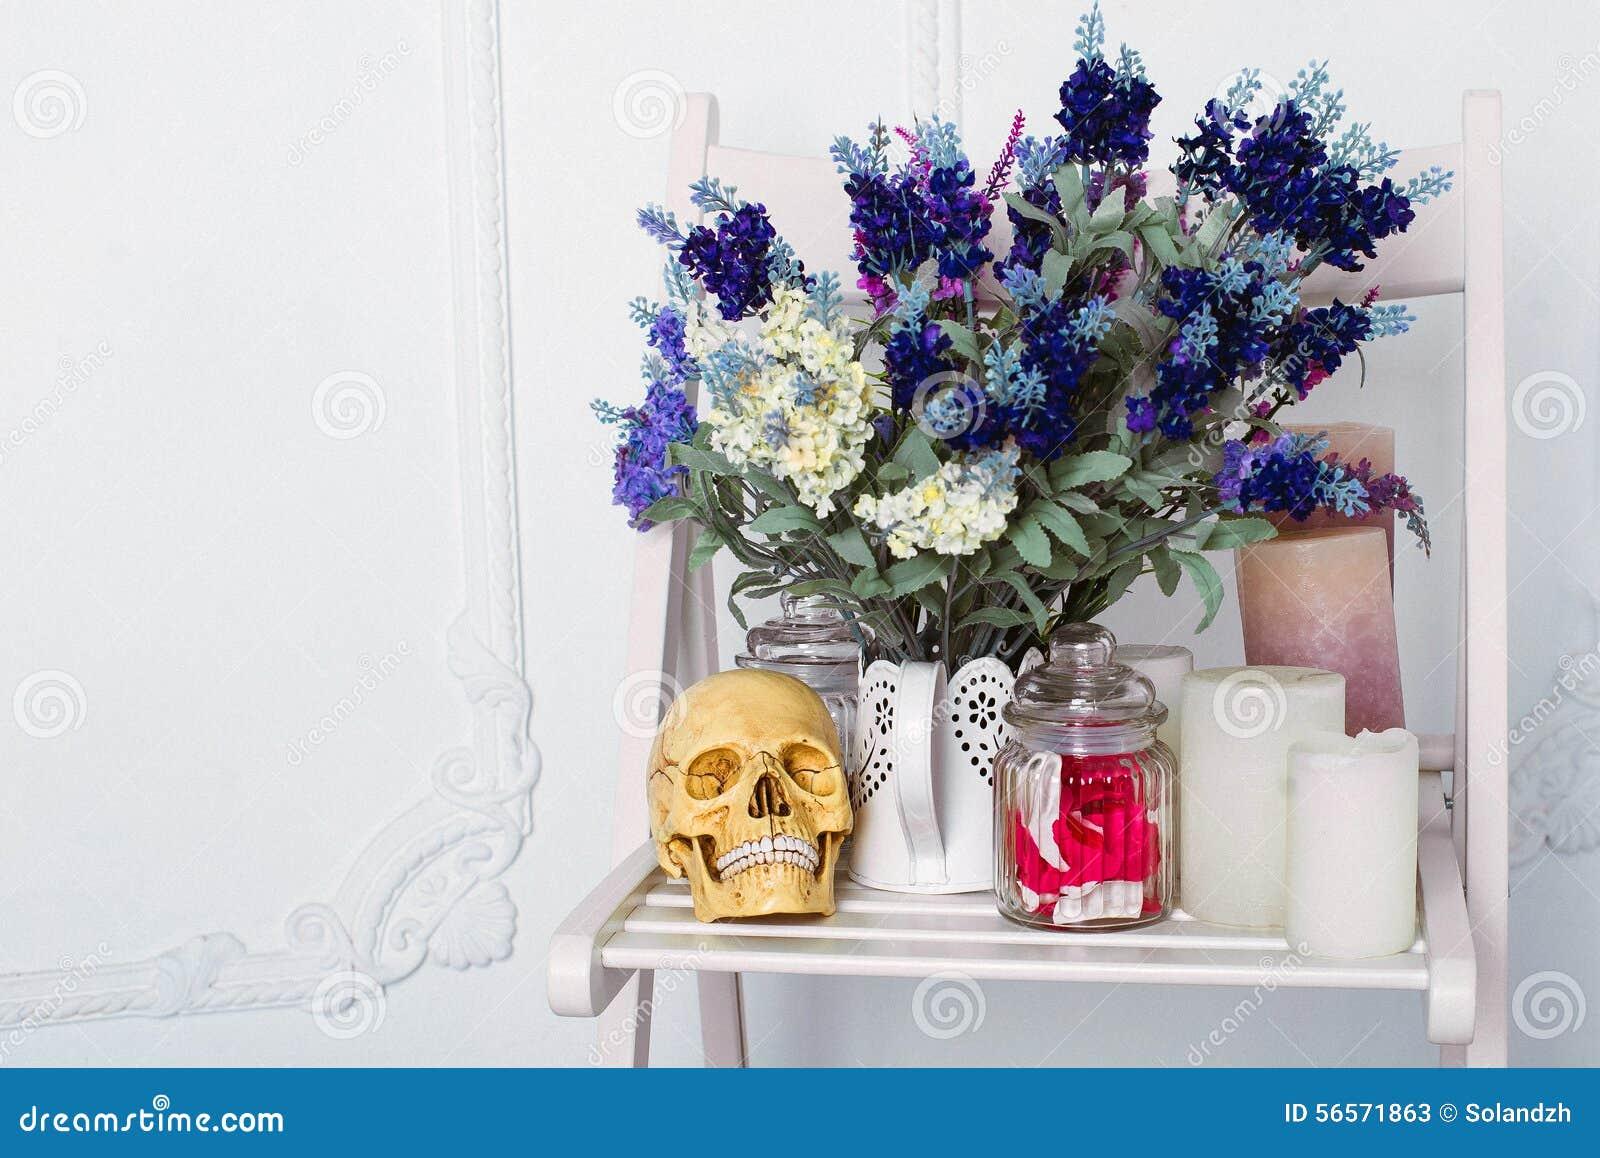 Download Ακόμα η ζωή Lavender των λουλουδιών σε ένα πότισμα μπορεί με τα κεριά και Sculp σε μια άσπρη καρέκλα Στοκ Εικόνα - εικόνα από βάζο, ανατομίας: 56571863